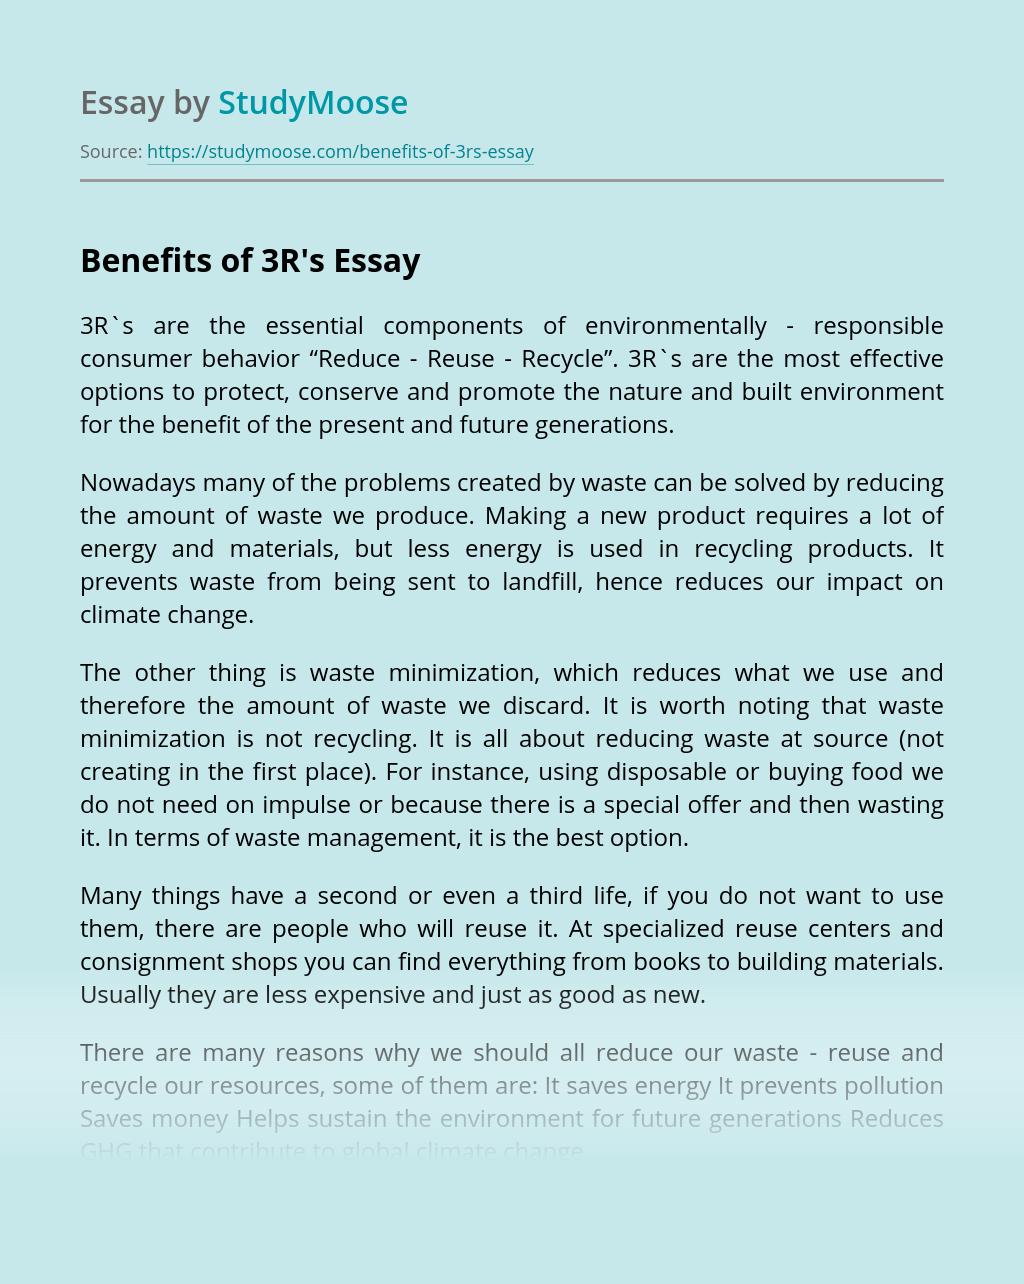 Benefits of 3R's